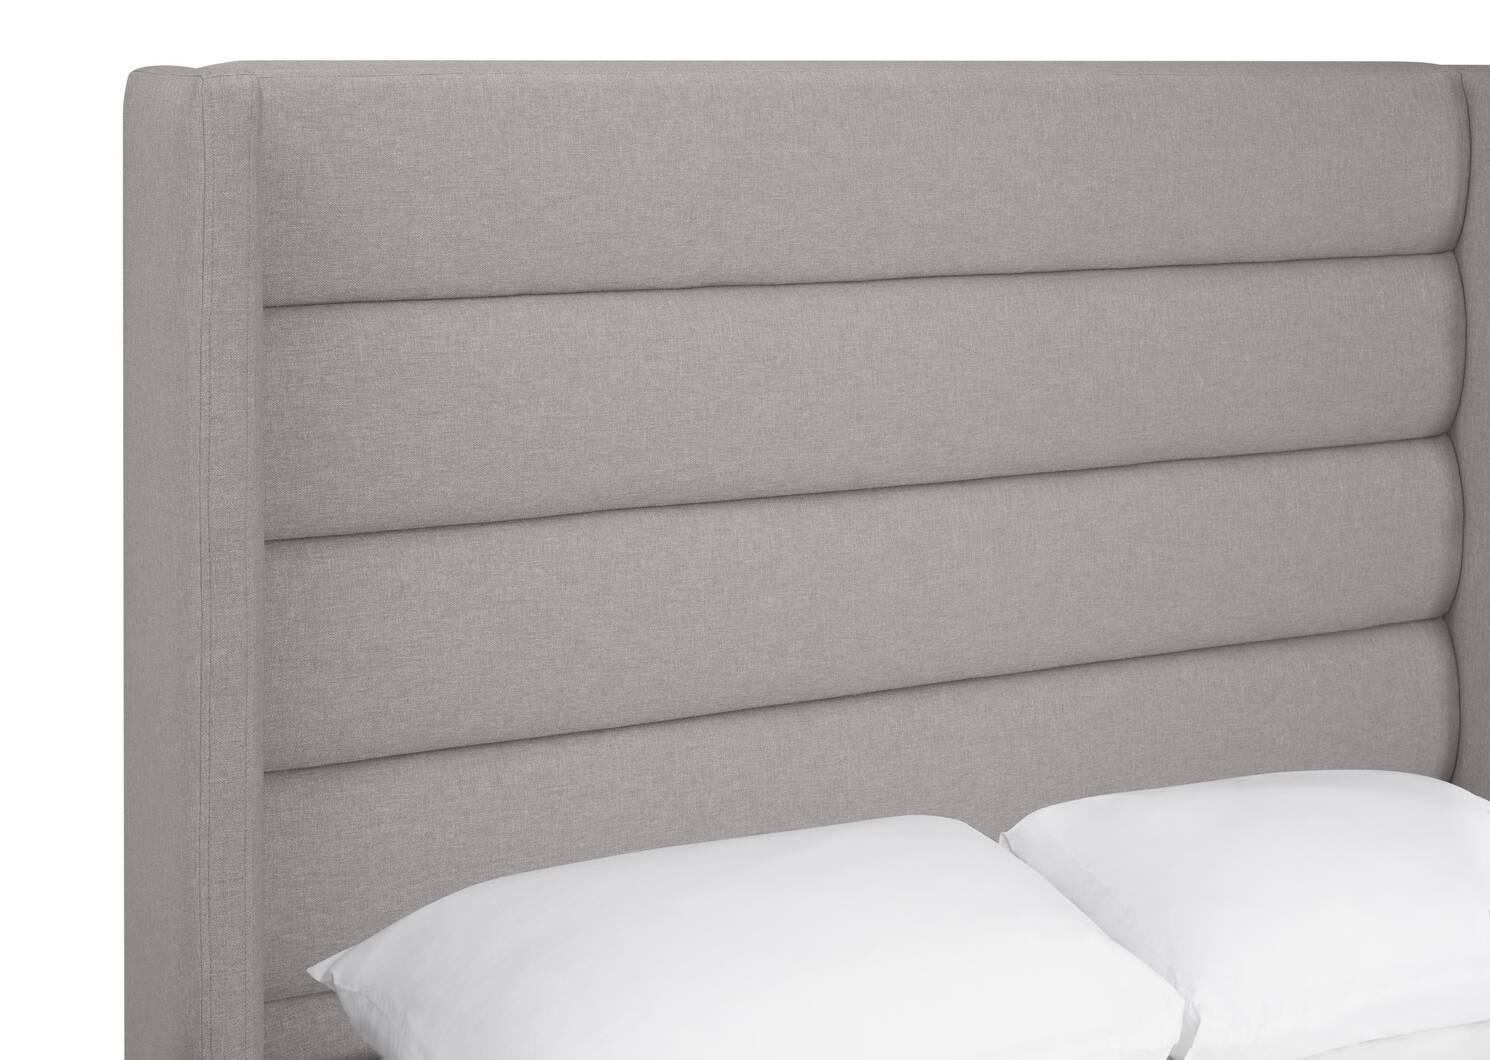 Rolston Custom Bed